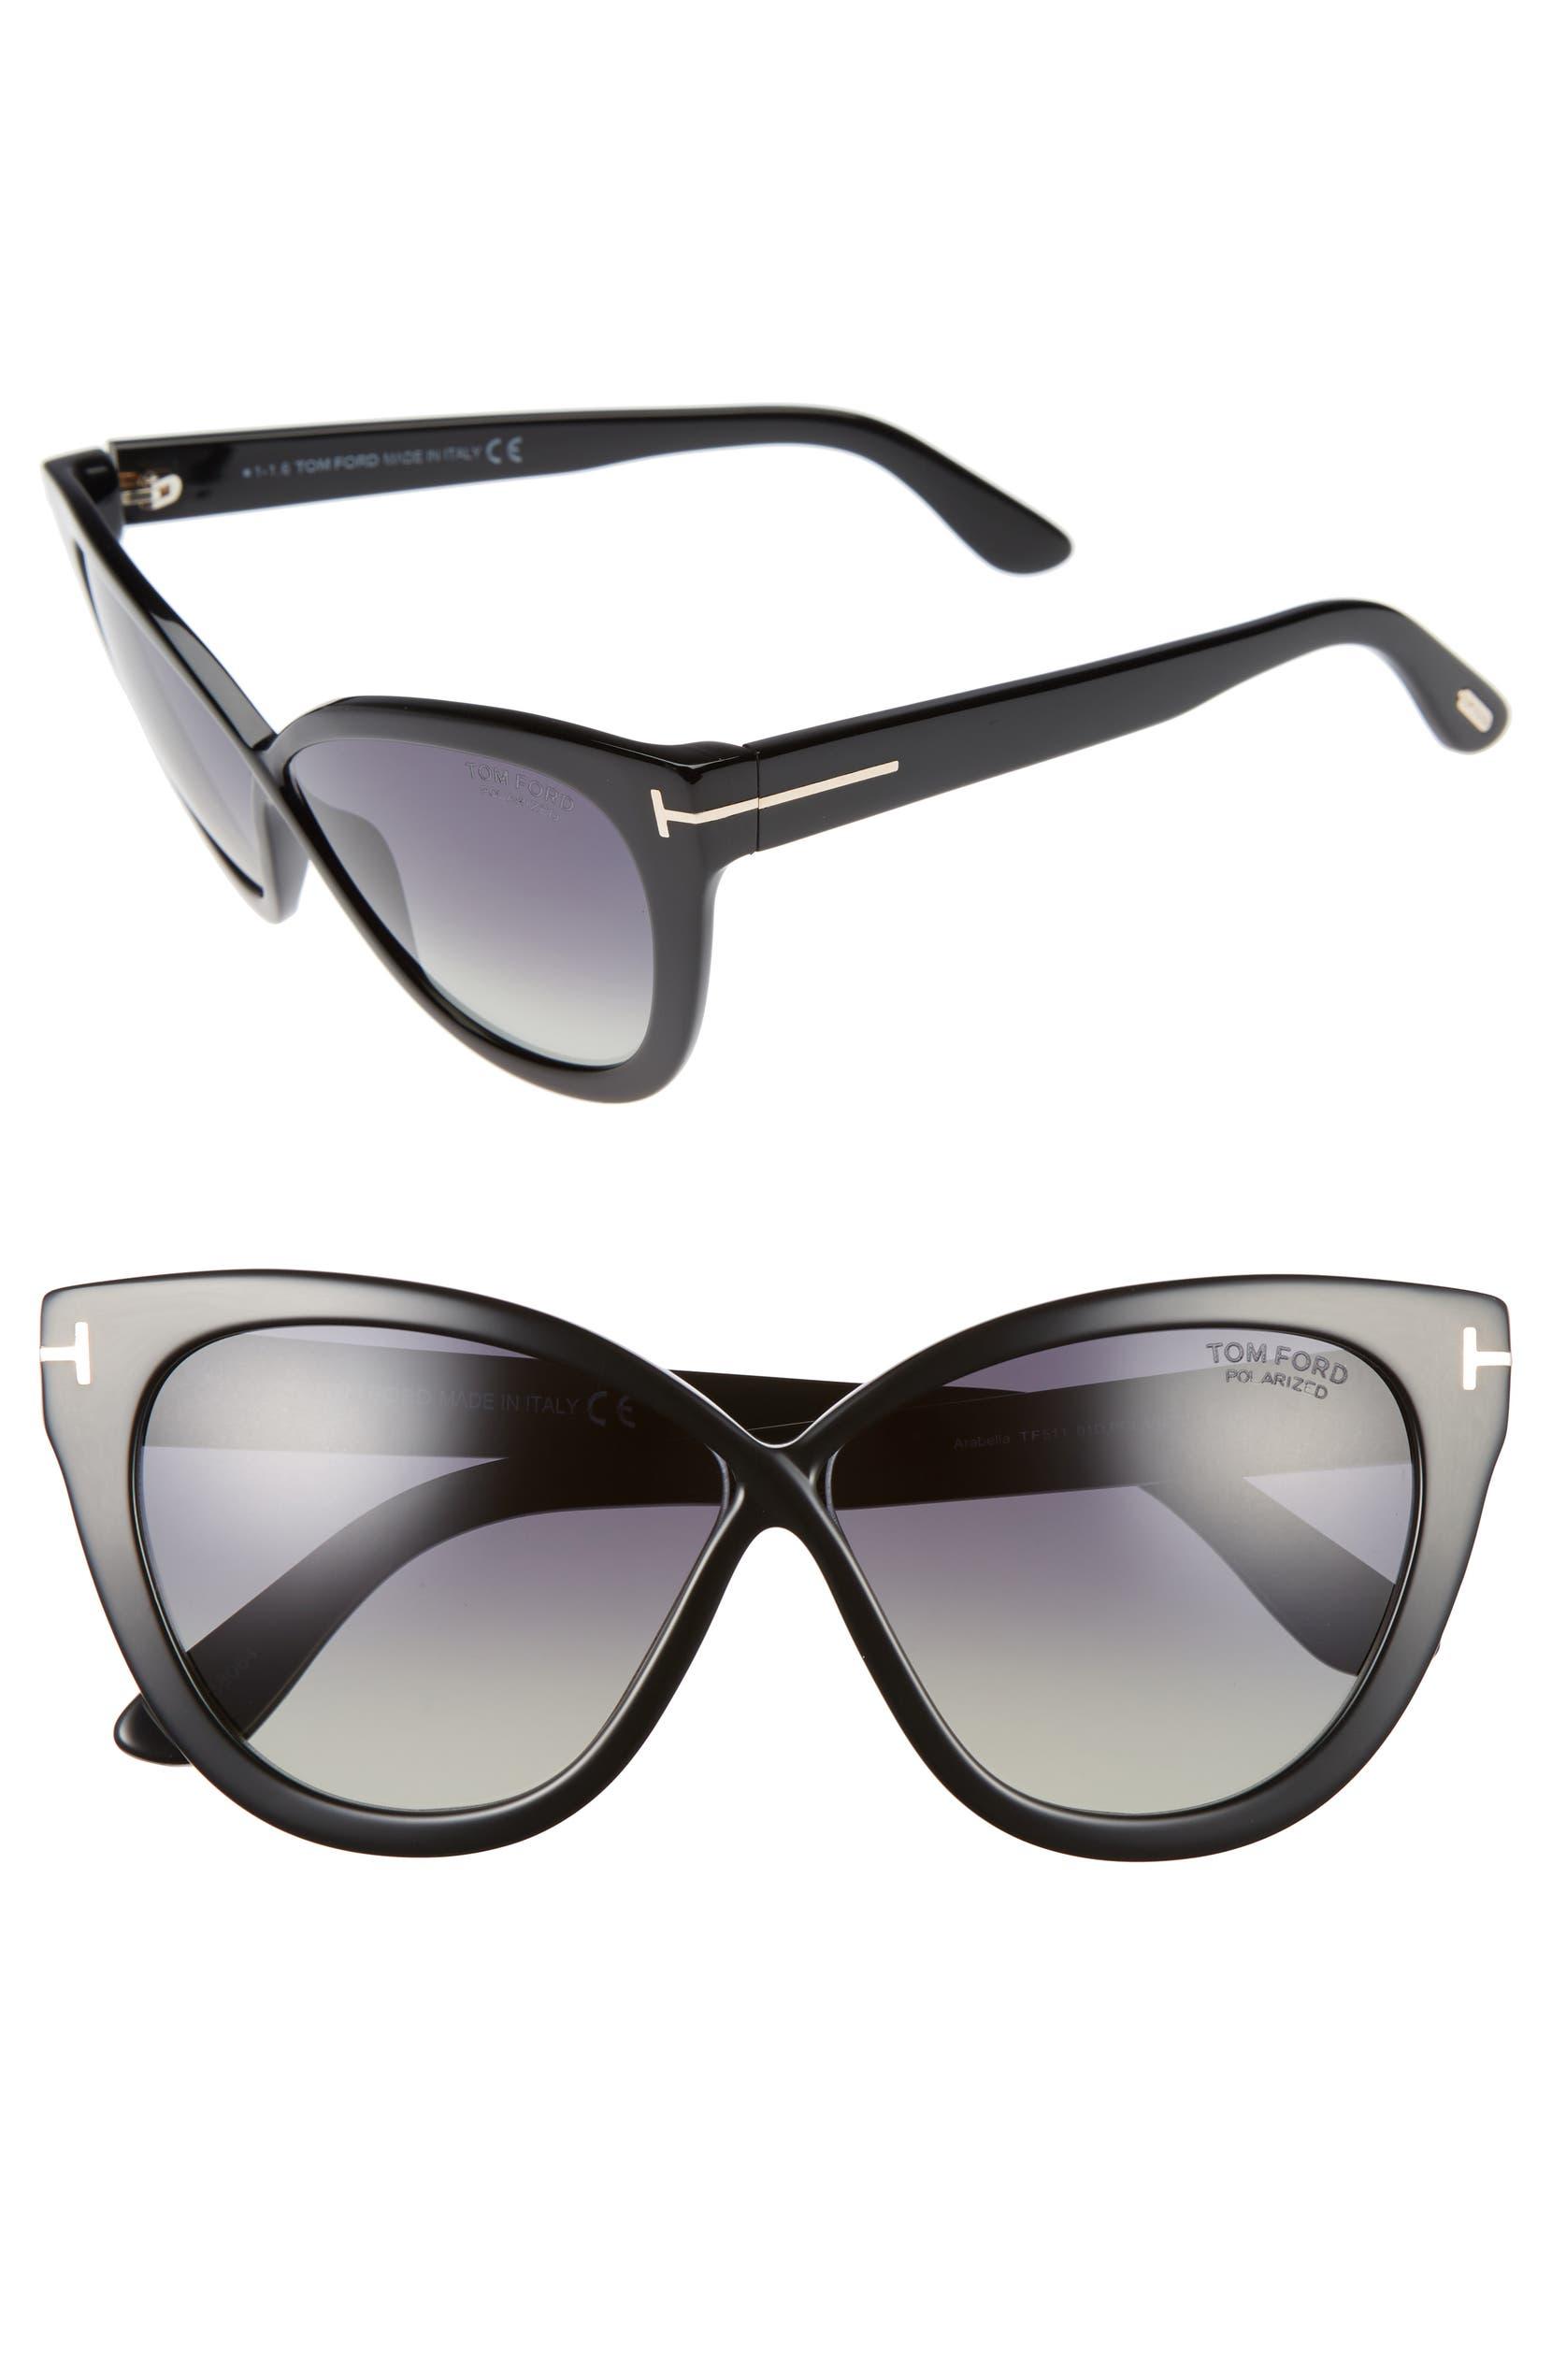 a13600e2db87 Tom Ford Arabella 59mm Cat Eye Sunglasses